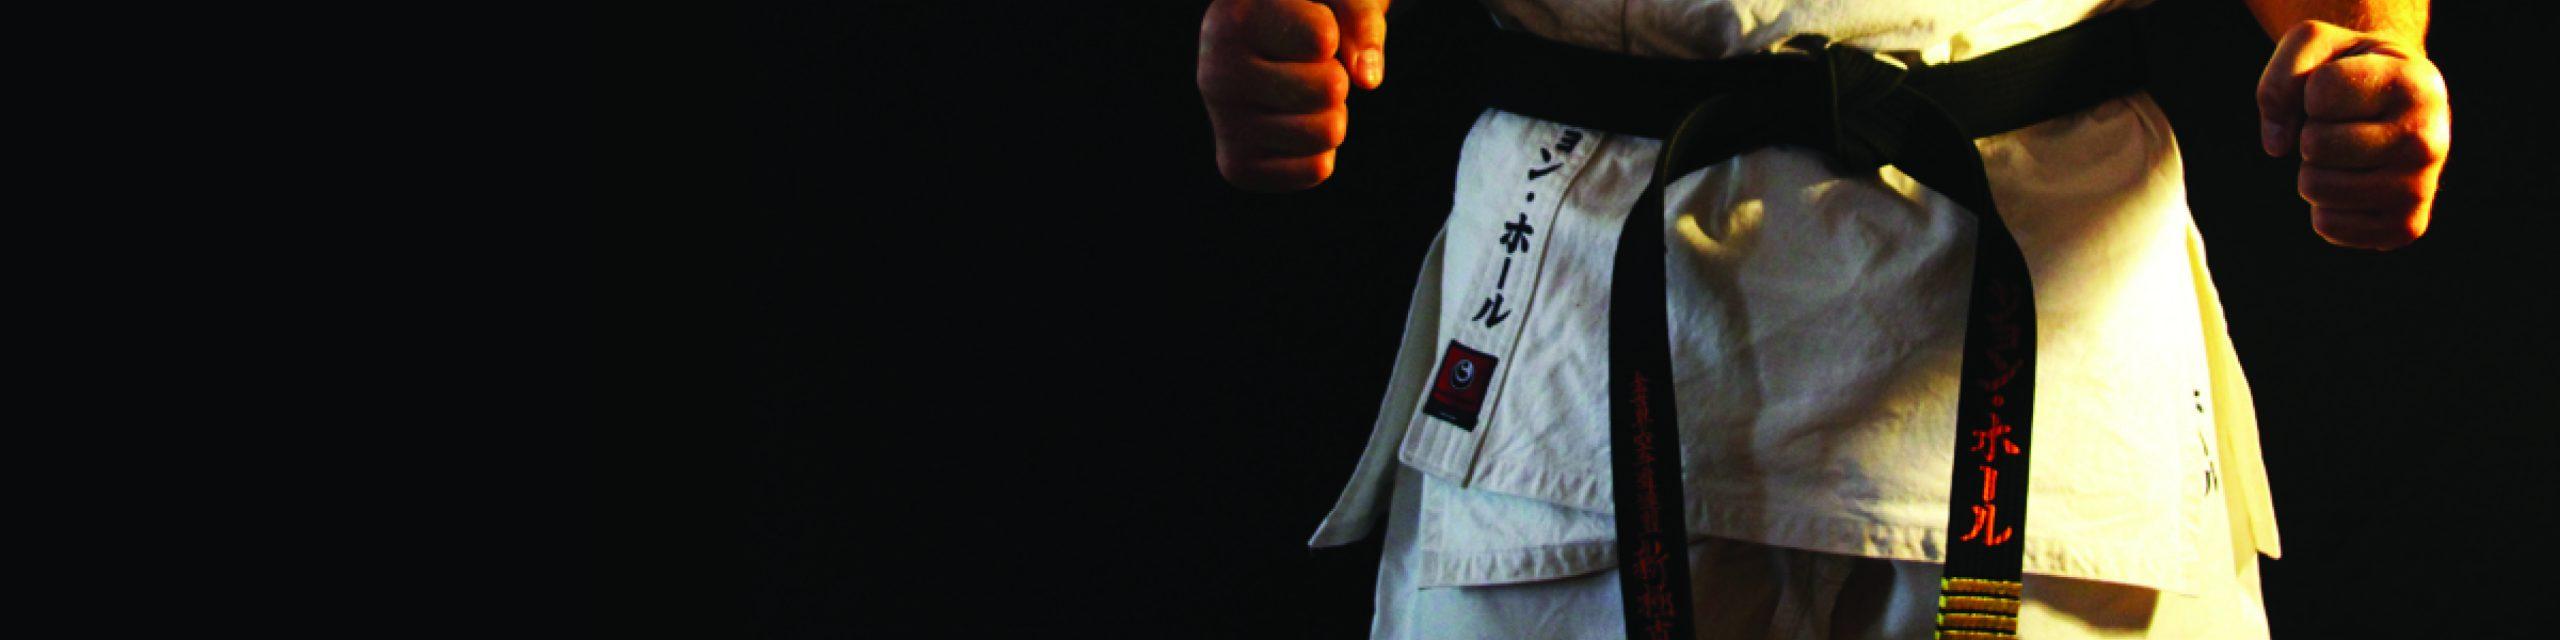 Shinkyokushin Karate - Wollongong Dojo